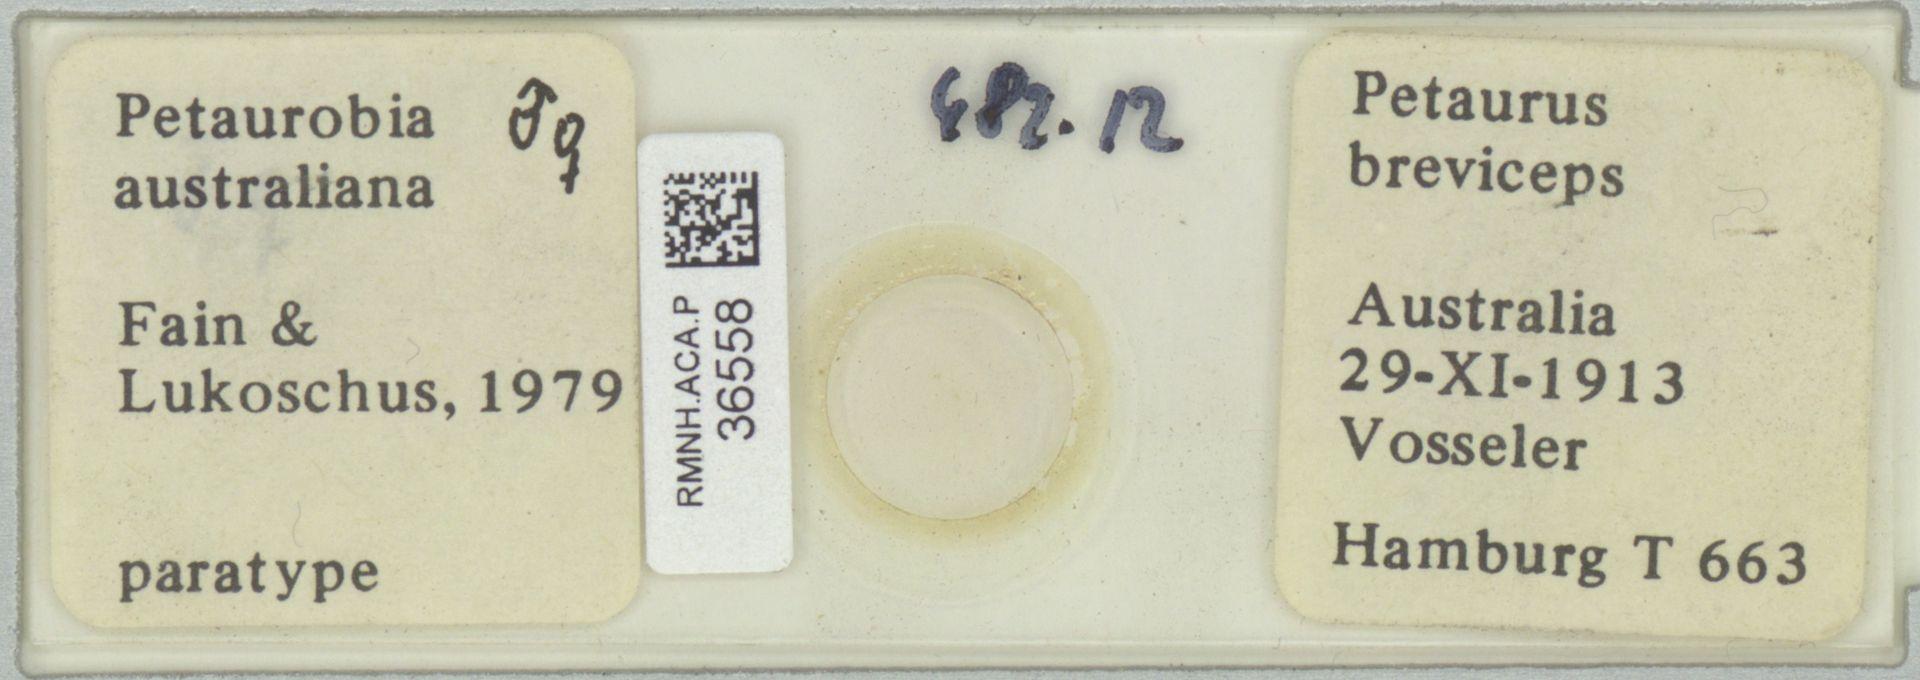 RMNH.ACA.P.36558   Petaurobia australiana Fain & Lukoschus, 1979